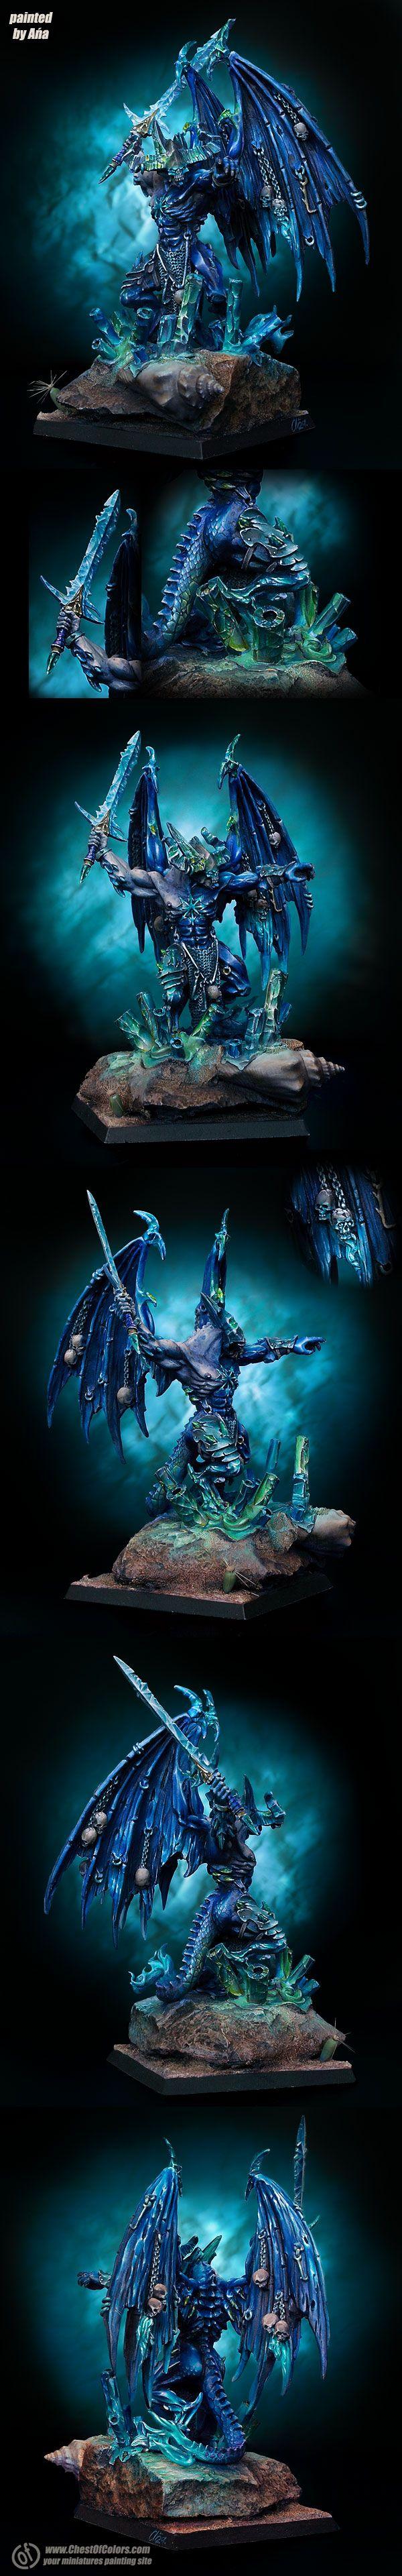 Chaos Demon Prince of Tzeentch - based on Be'Lakor